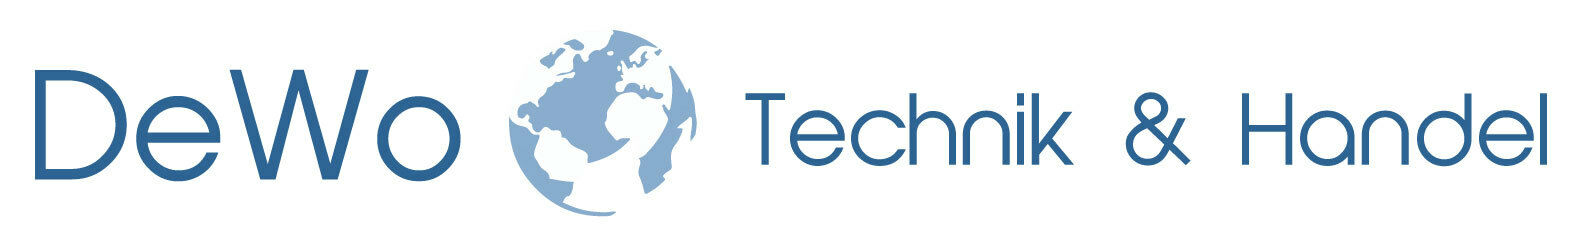 DeWo Technik & Handel UG